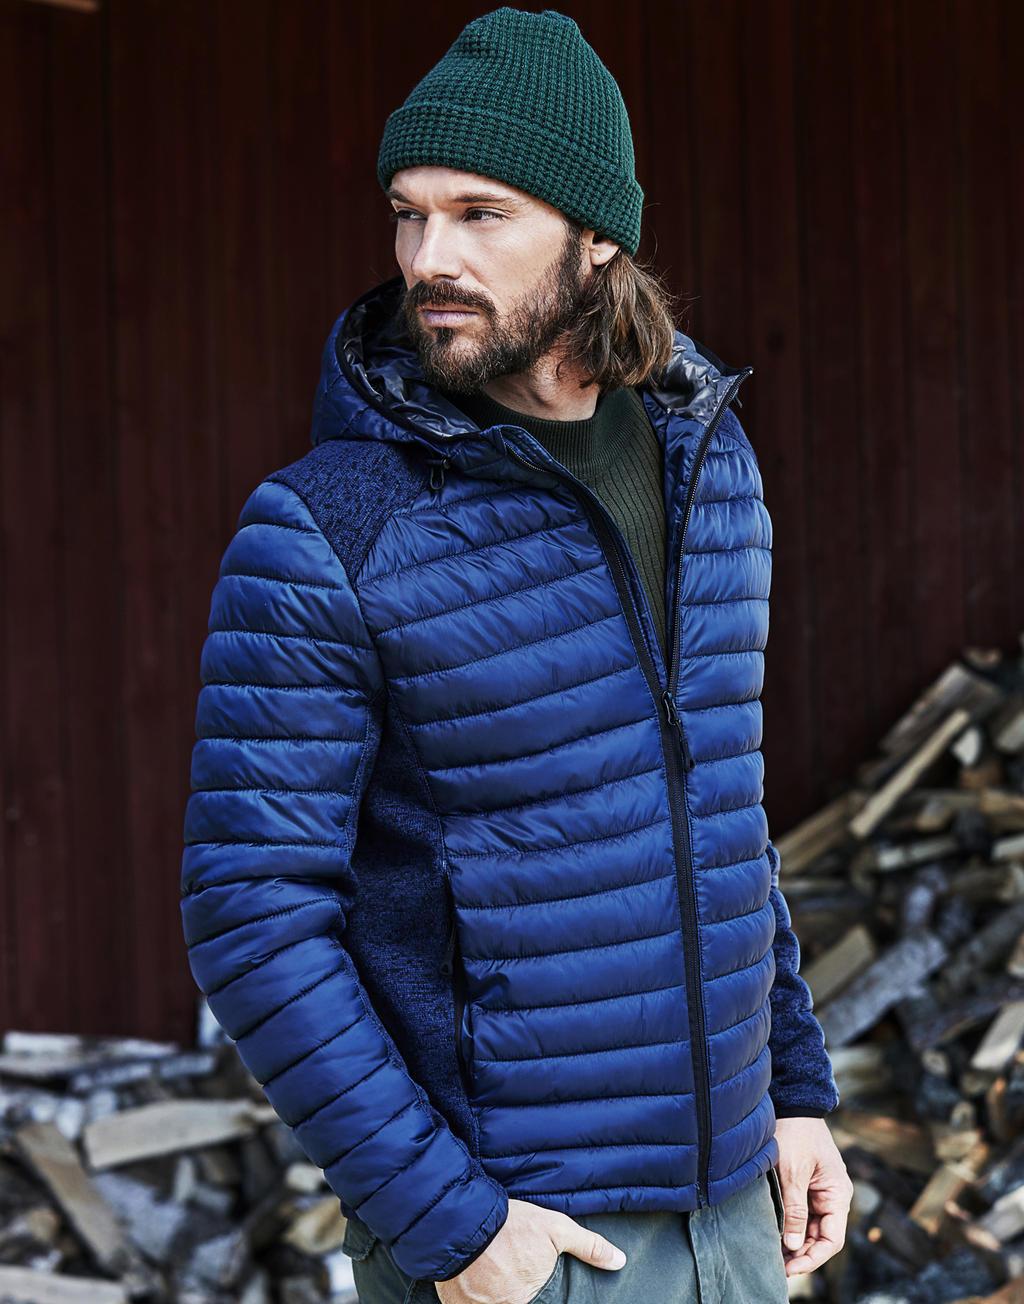 Hooded Jacket Outdoor Crossover Outdoor Hooded OPZiXTku